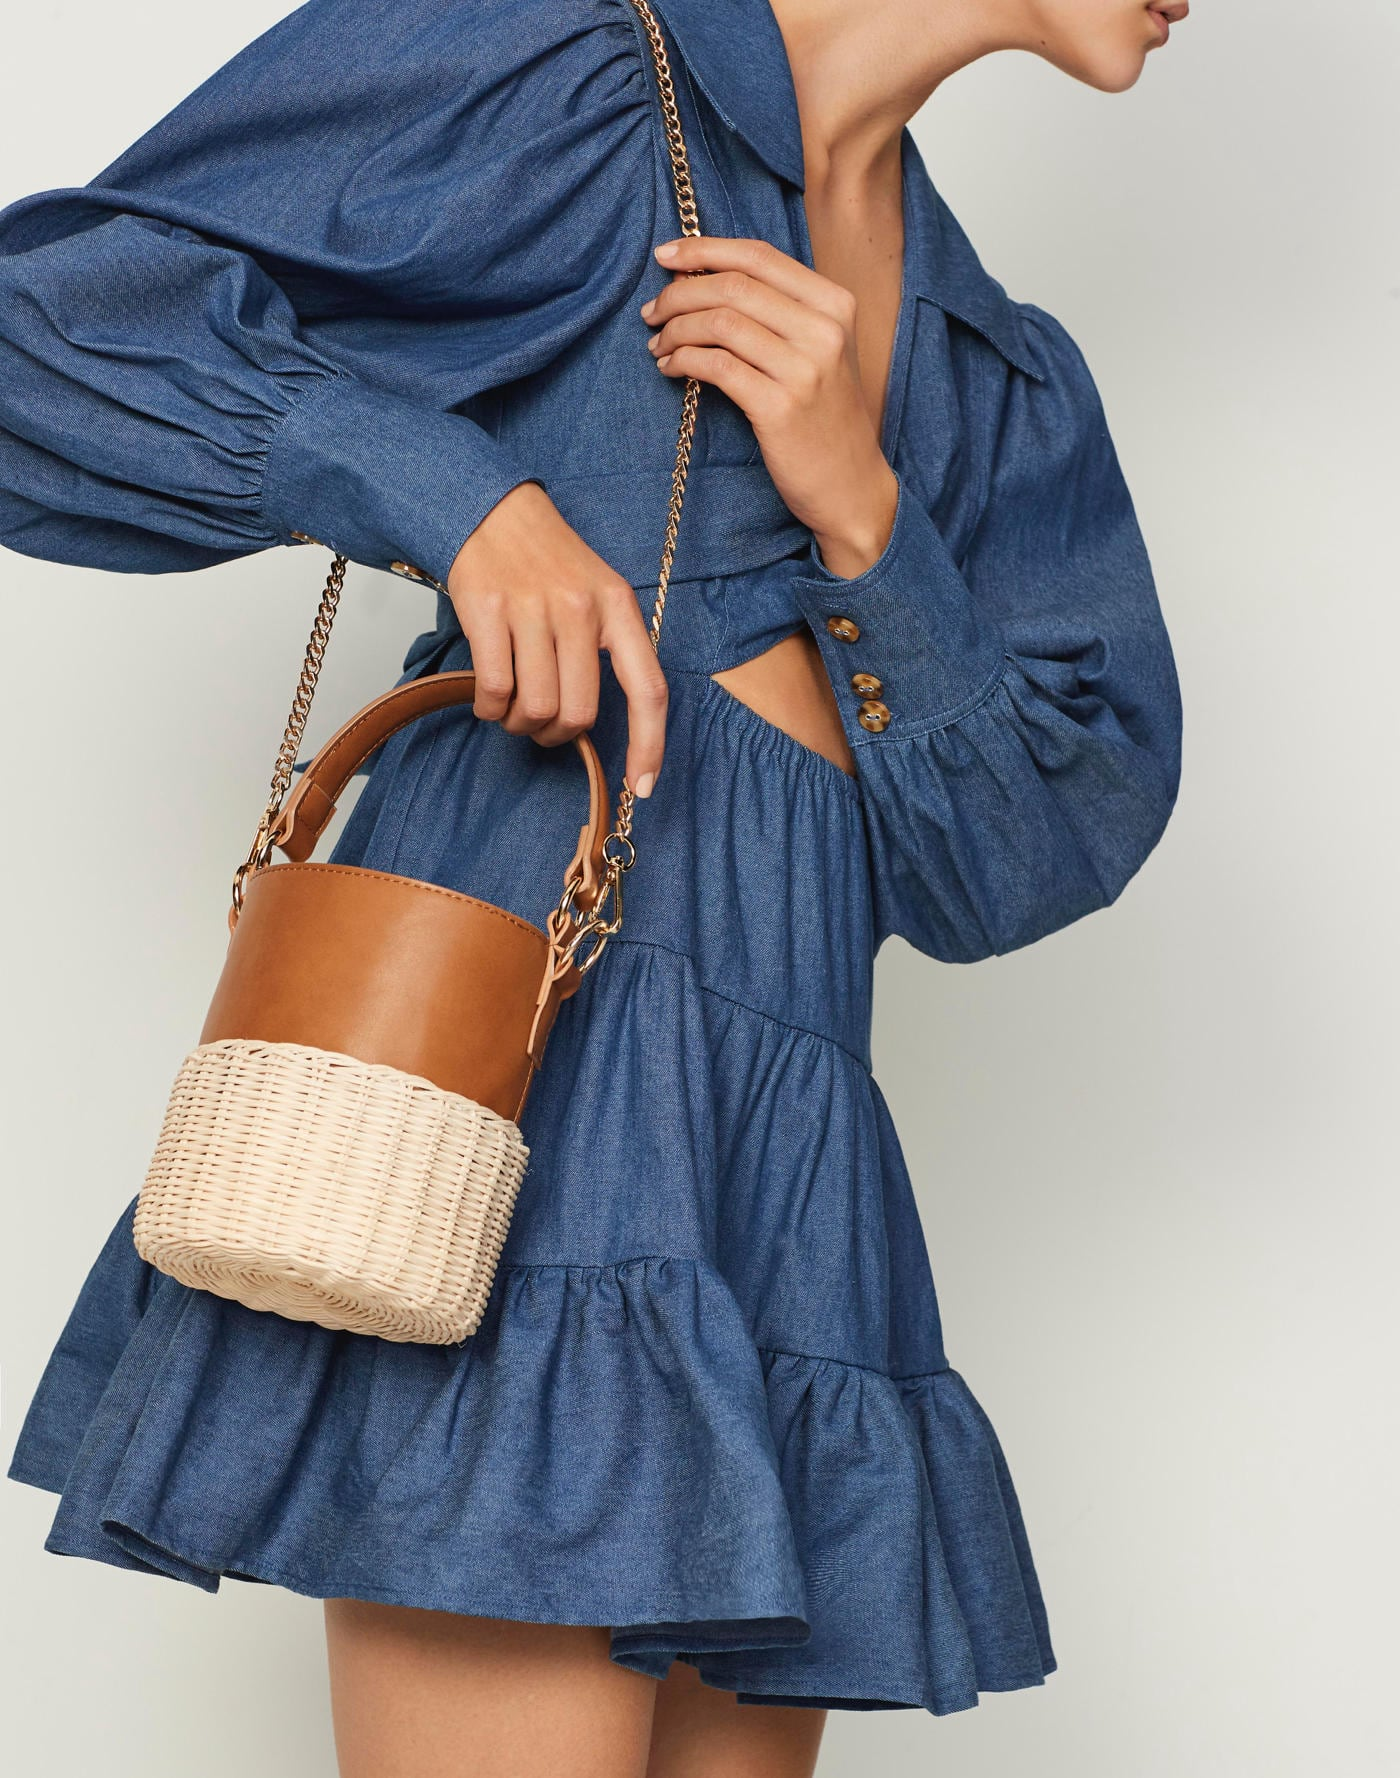 6689a4ea2fe4 All Handbags | ALDO Canada